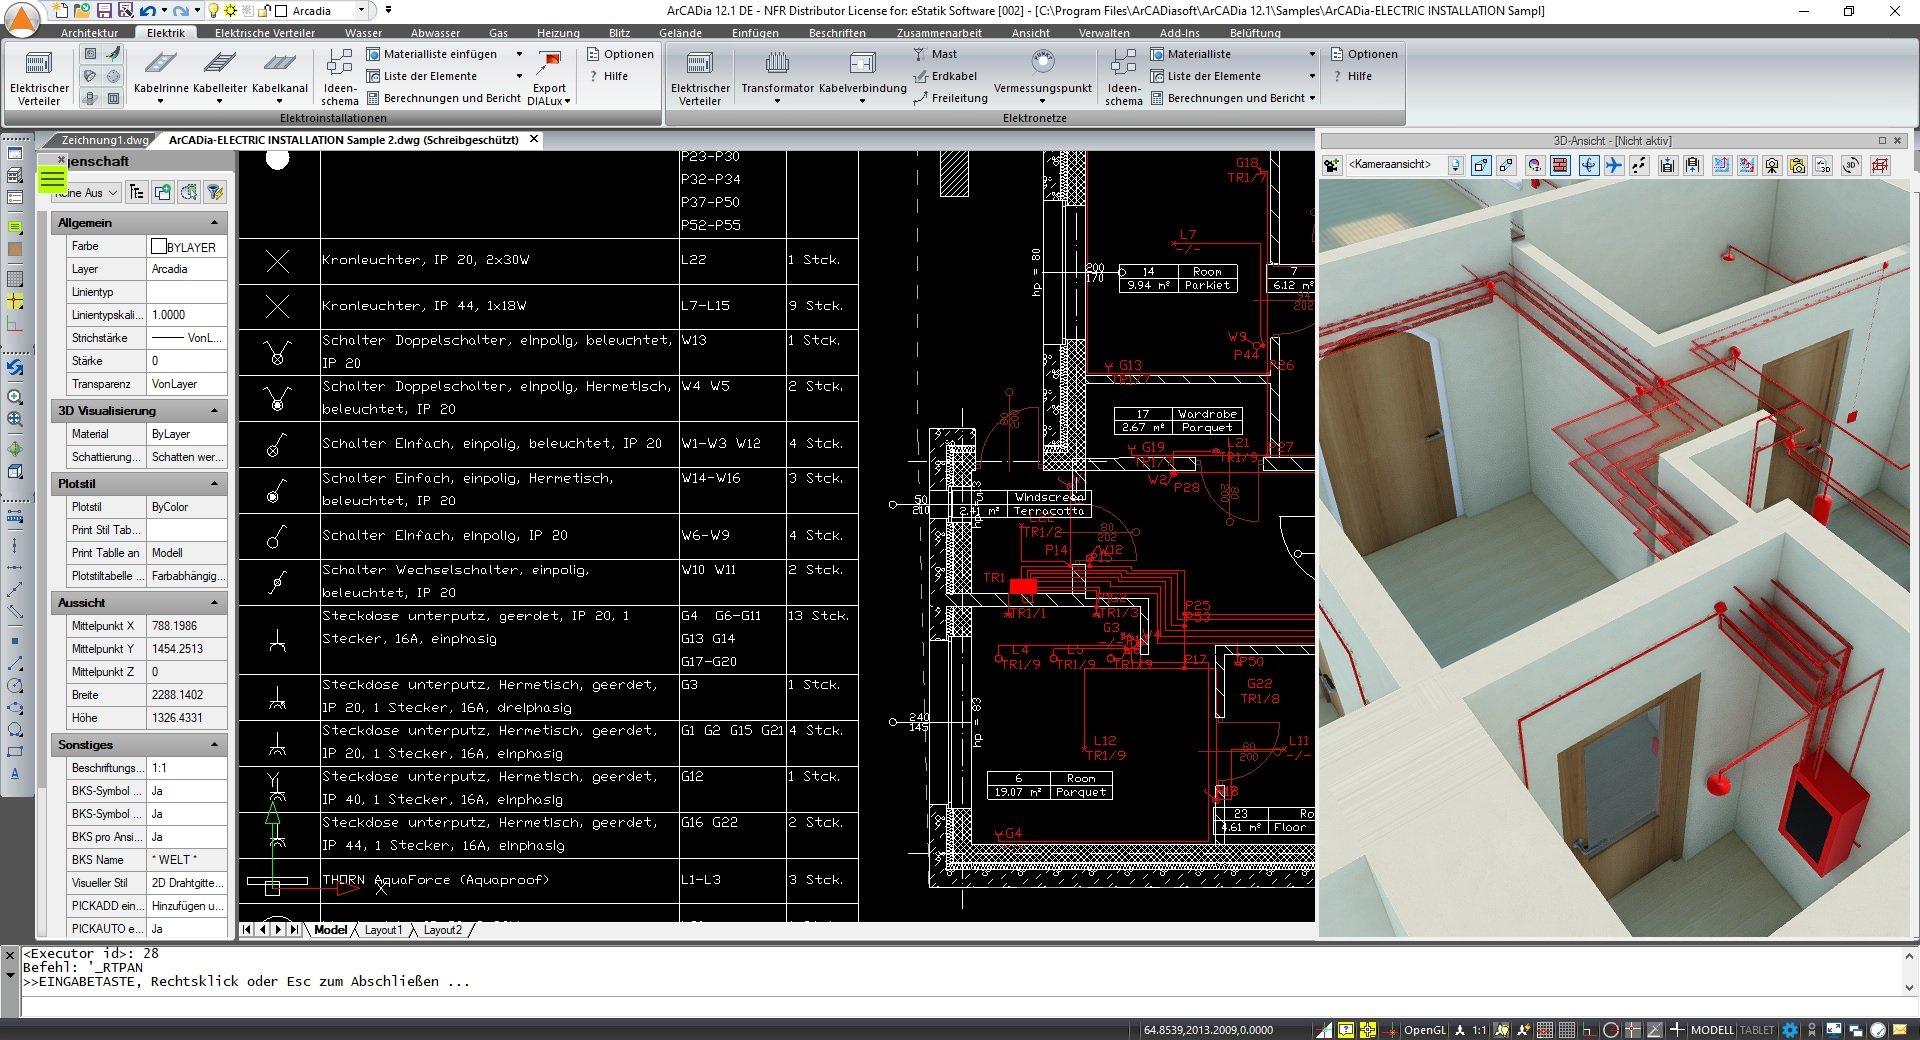 ArCADia BIM Elektroplanung Software - Elektroinstallationen Screenshot